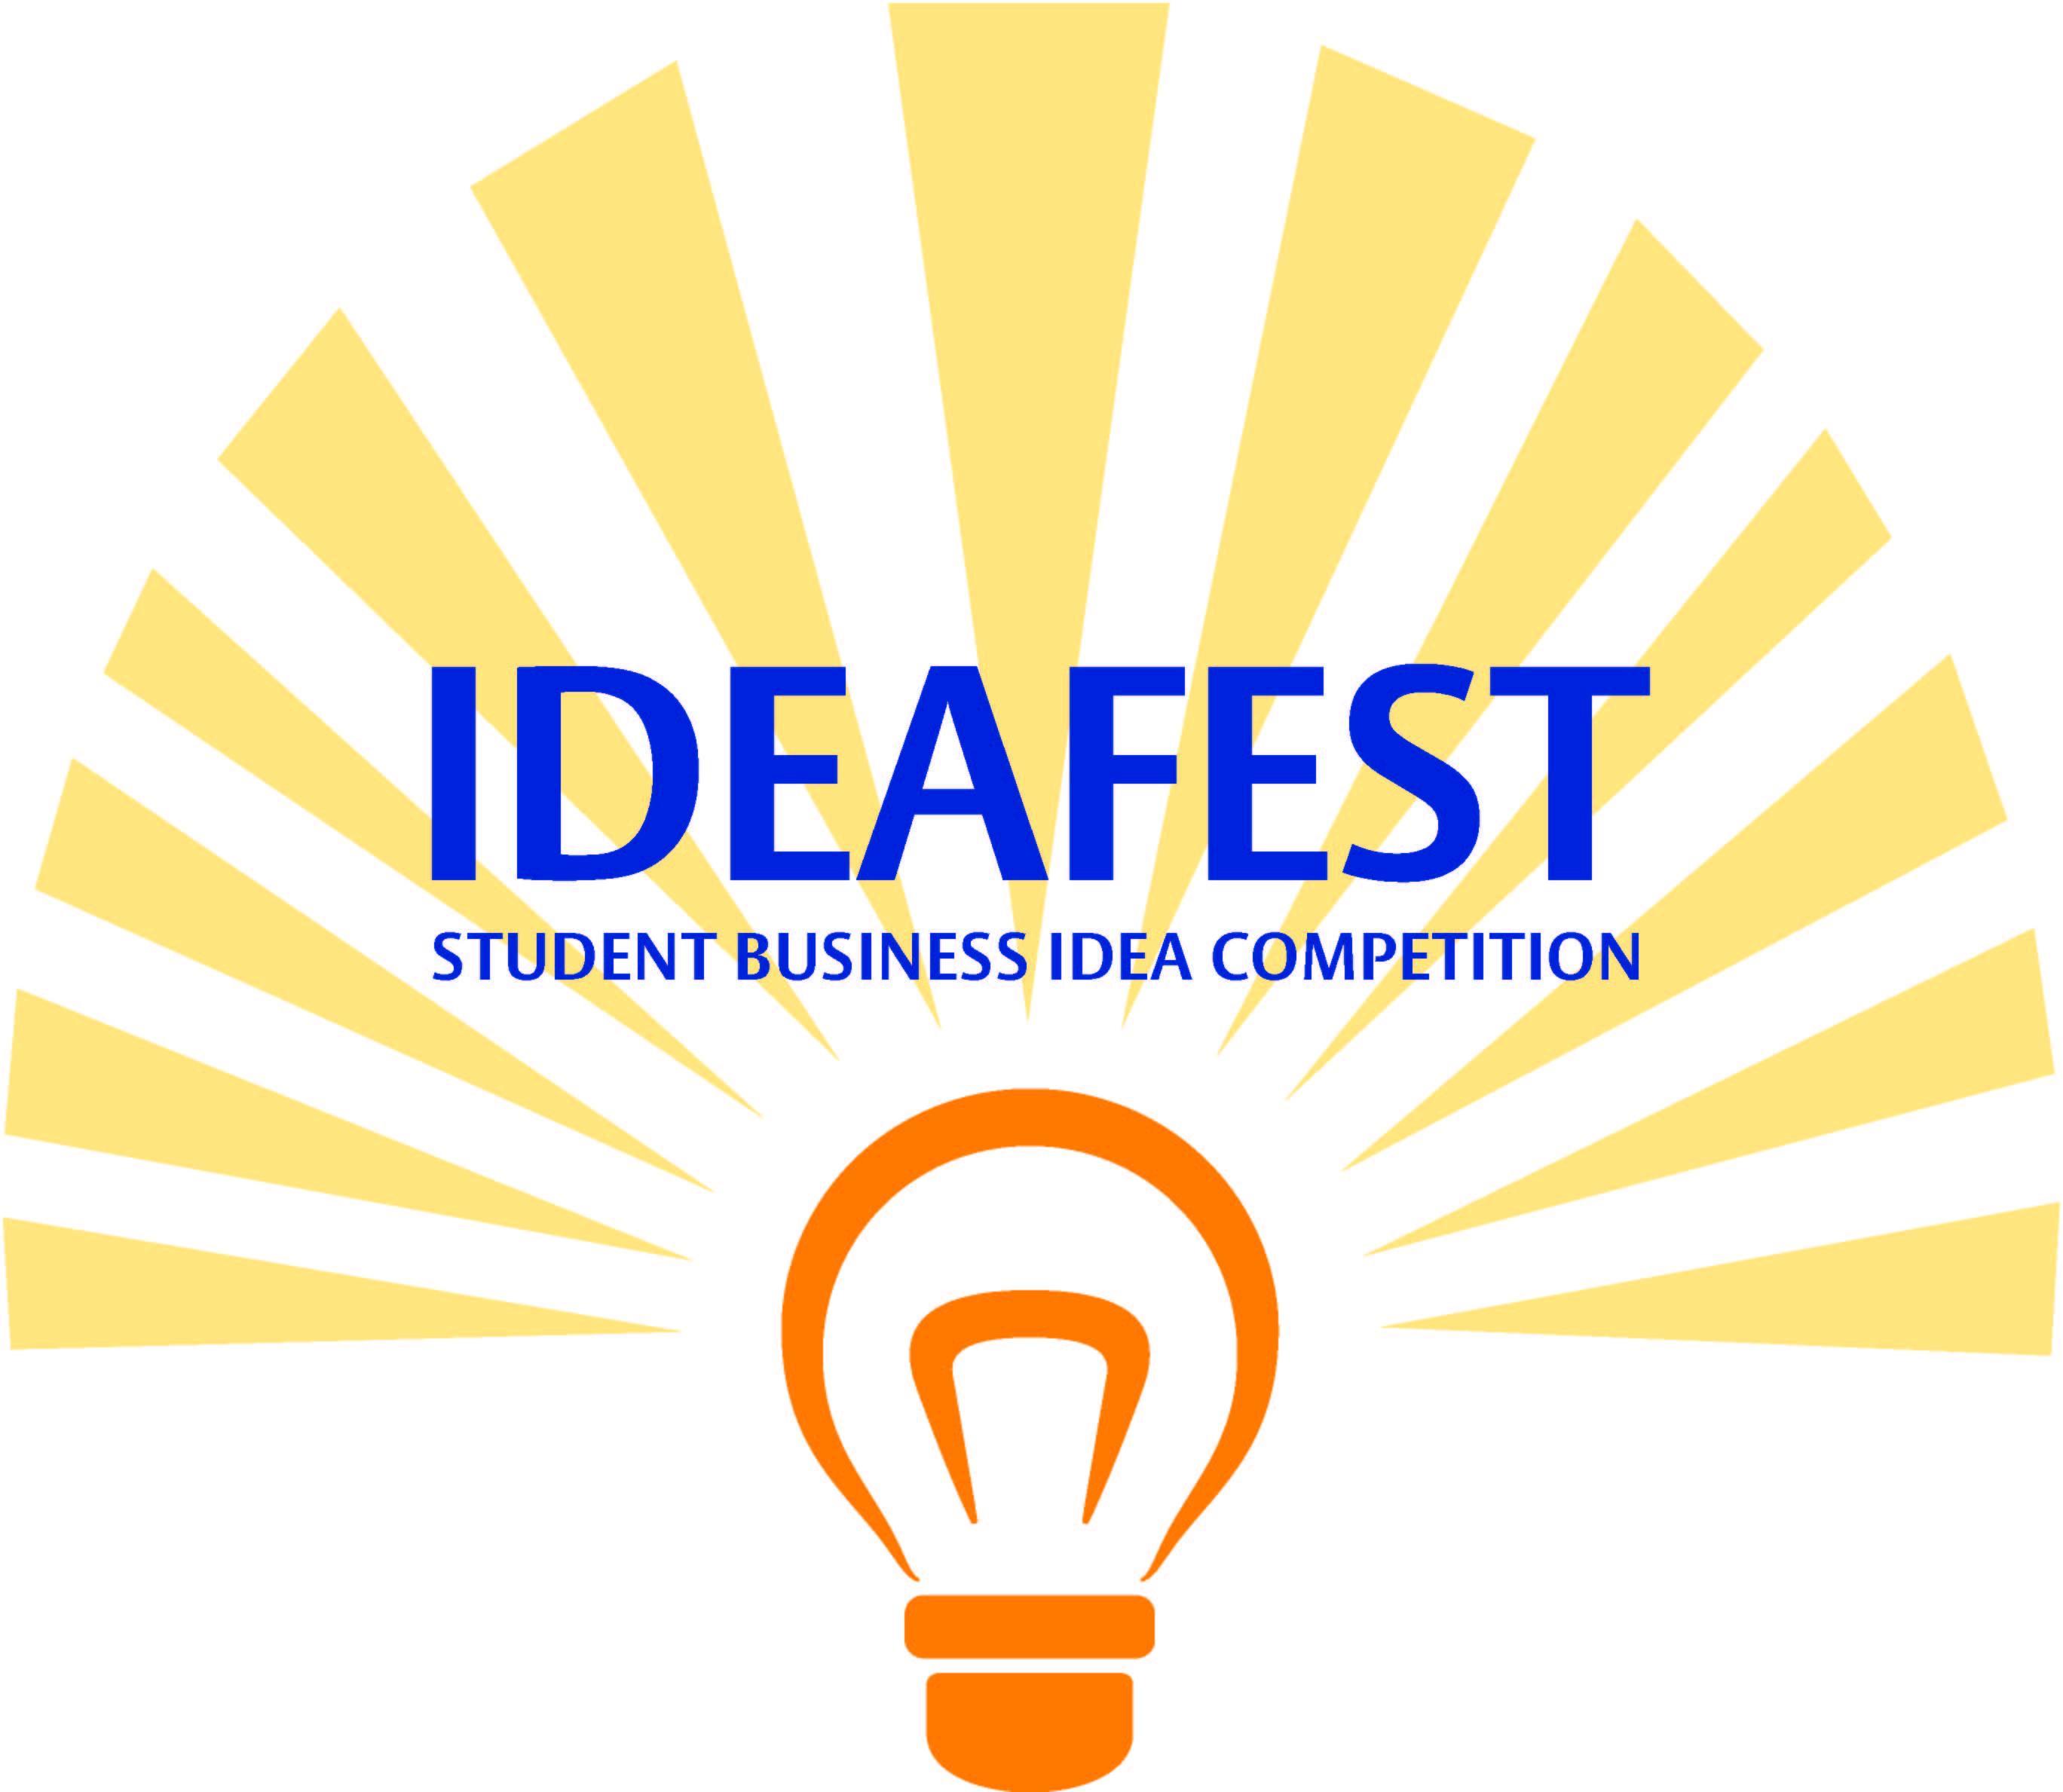 Ideafest-logo.jpg?mtime=20171130132339#asset:87279